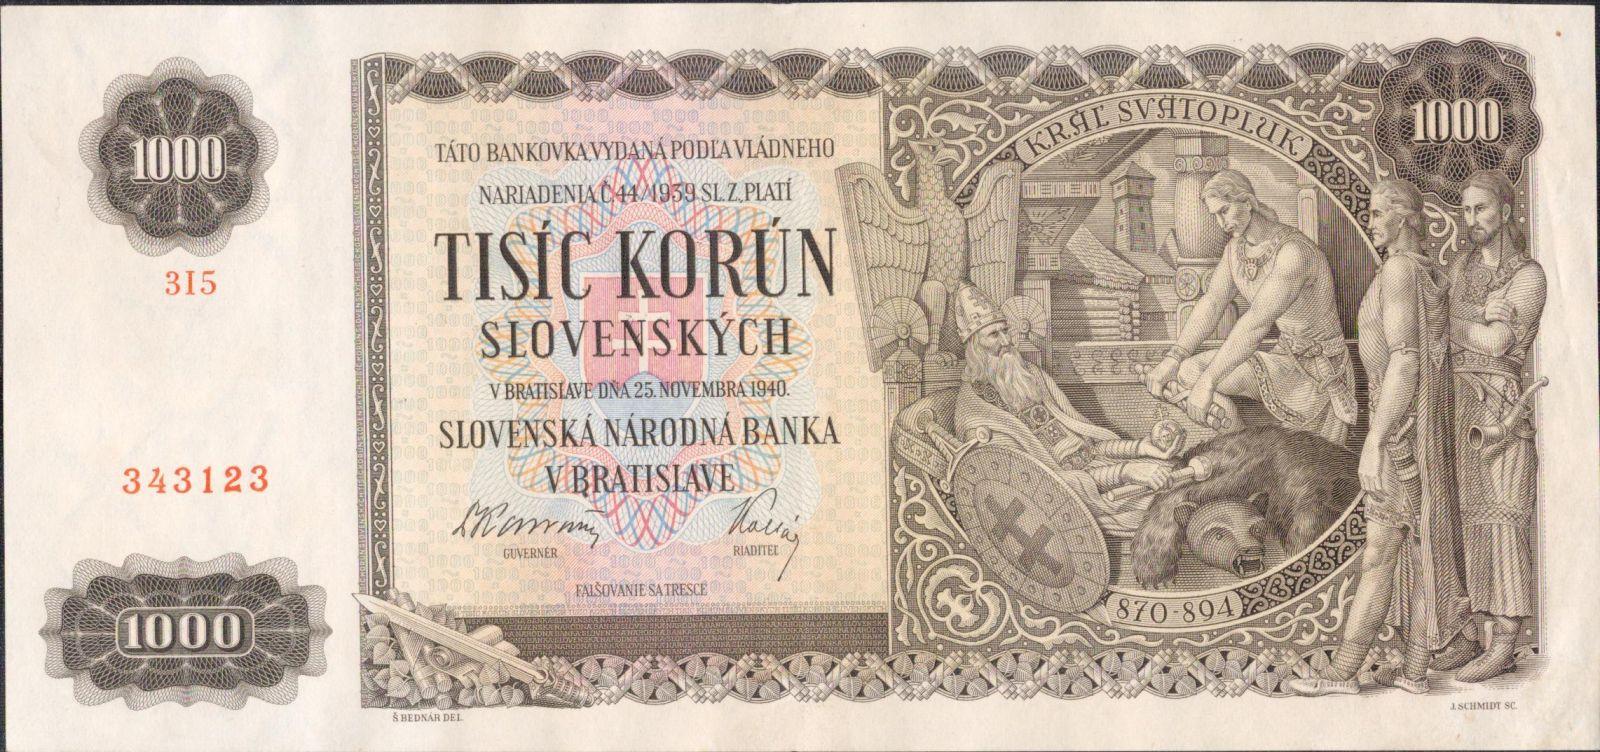 1000Ks/1940/, stav 1+, série 3I5